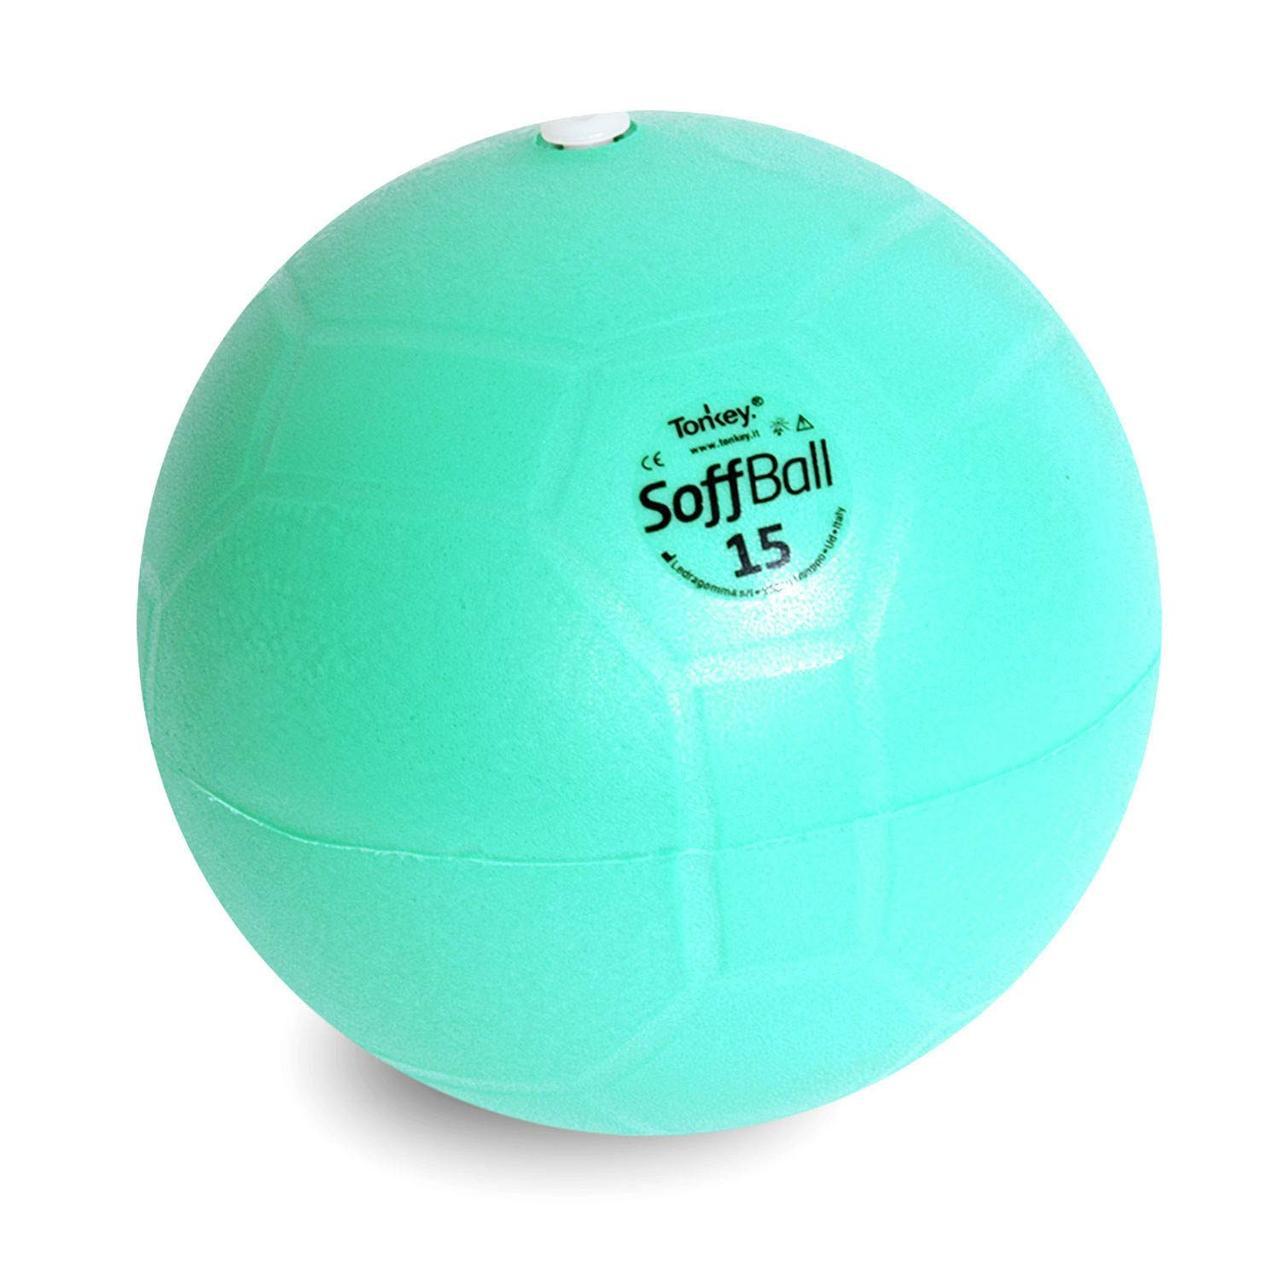 Фитнес оборудование: Мяч Ledragomma Soffball Maxafe 15 см